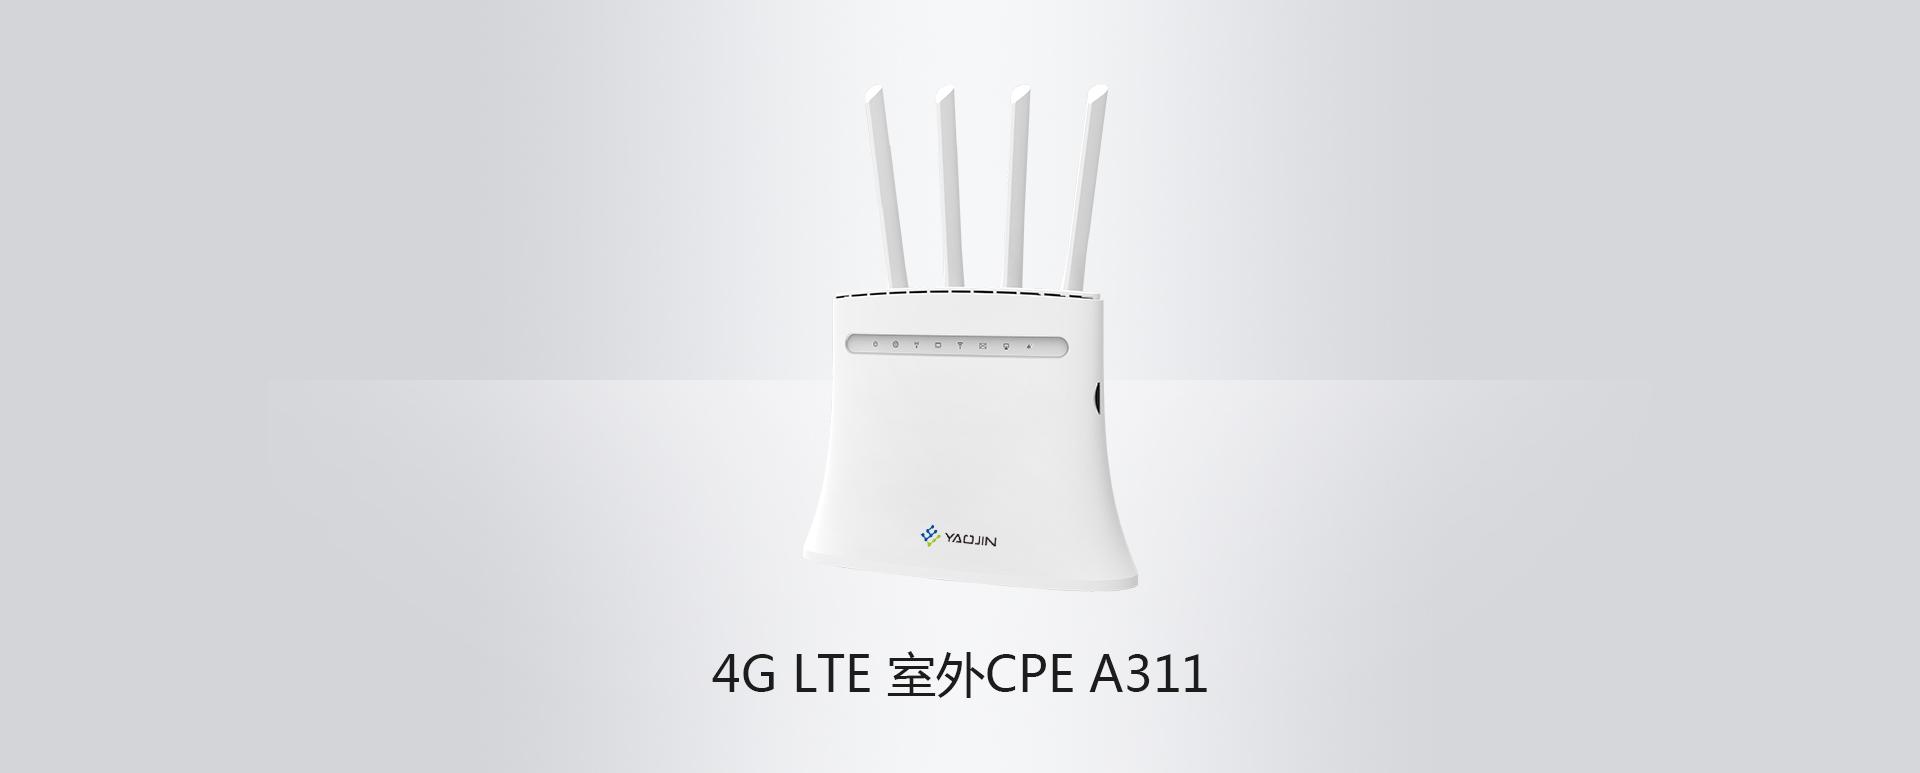 4G LTE 室外CPE A311